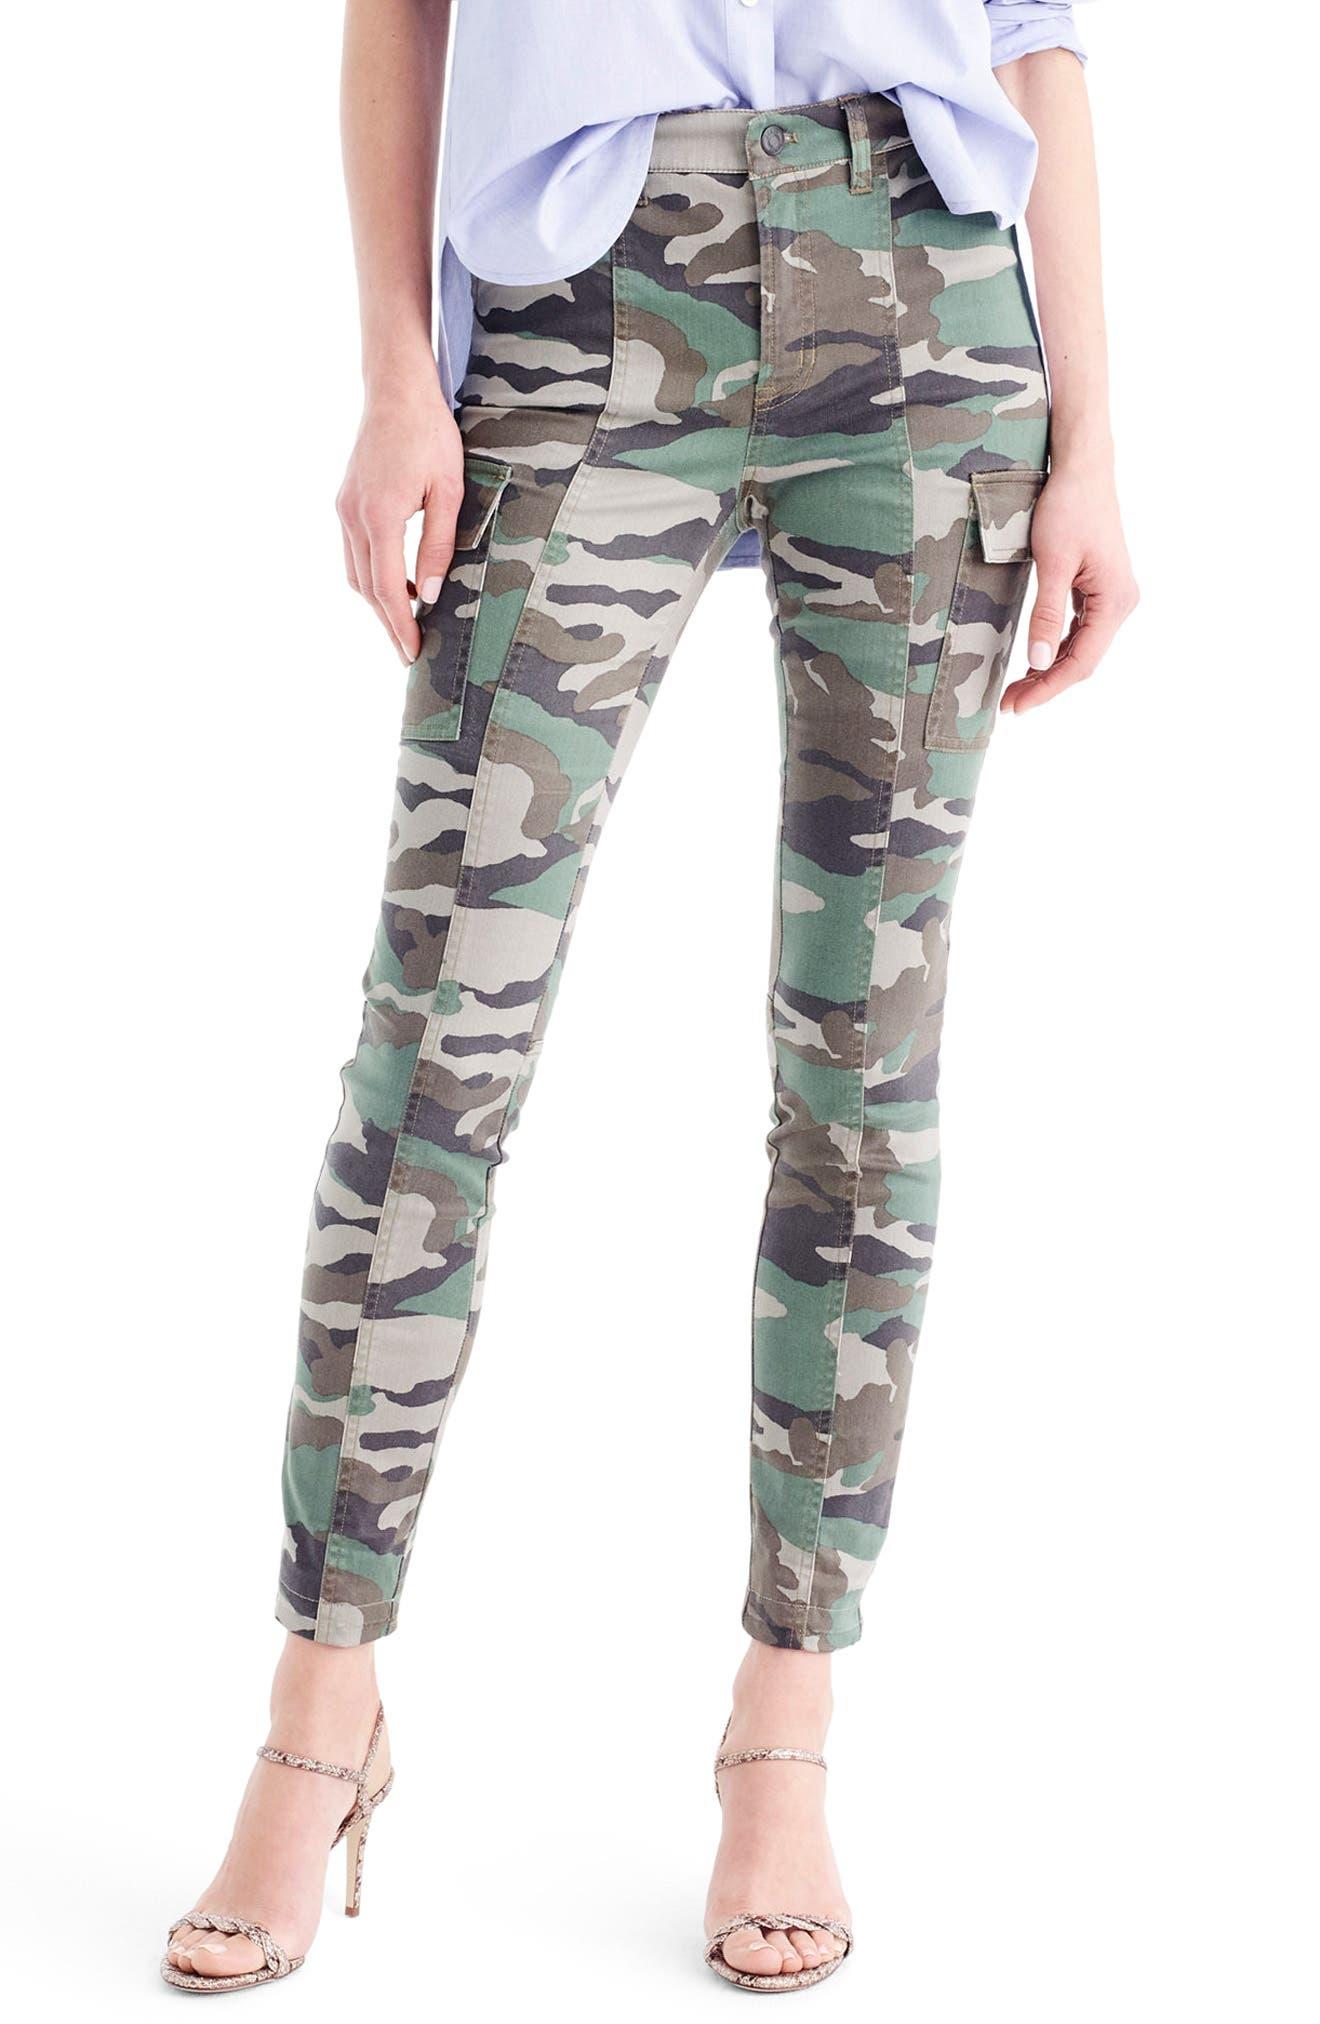 J.Crew Camo Skinny Cargo Pants